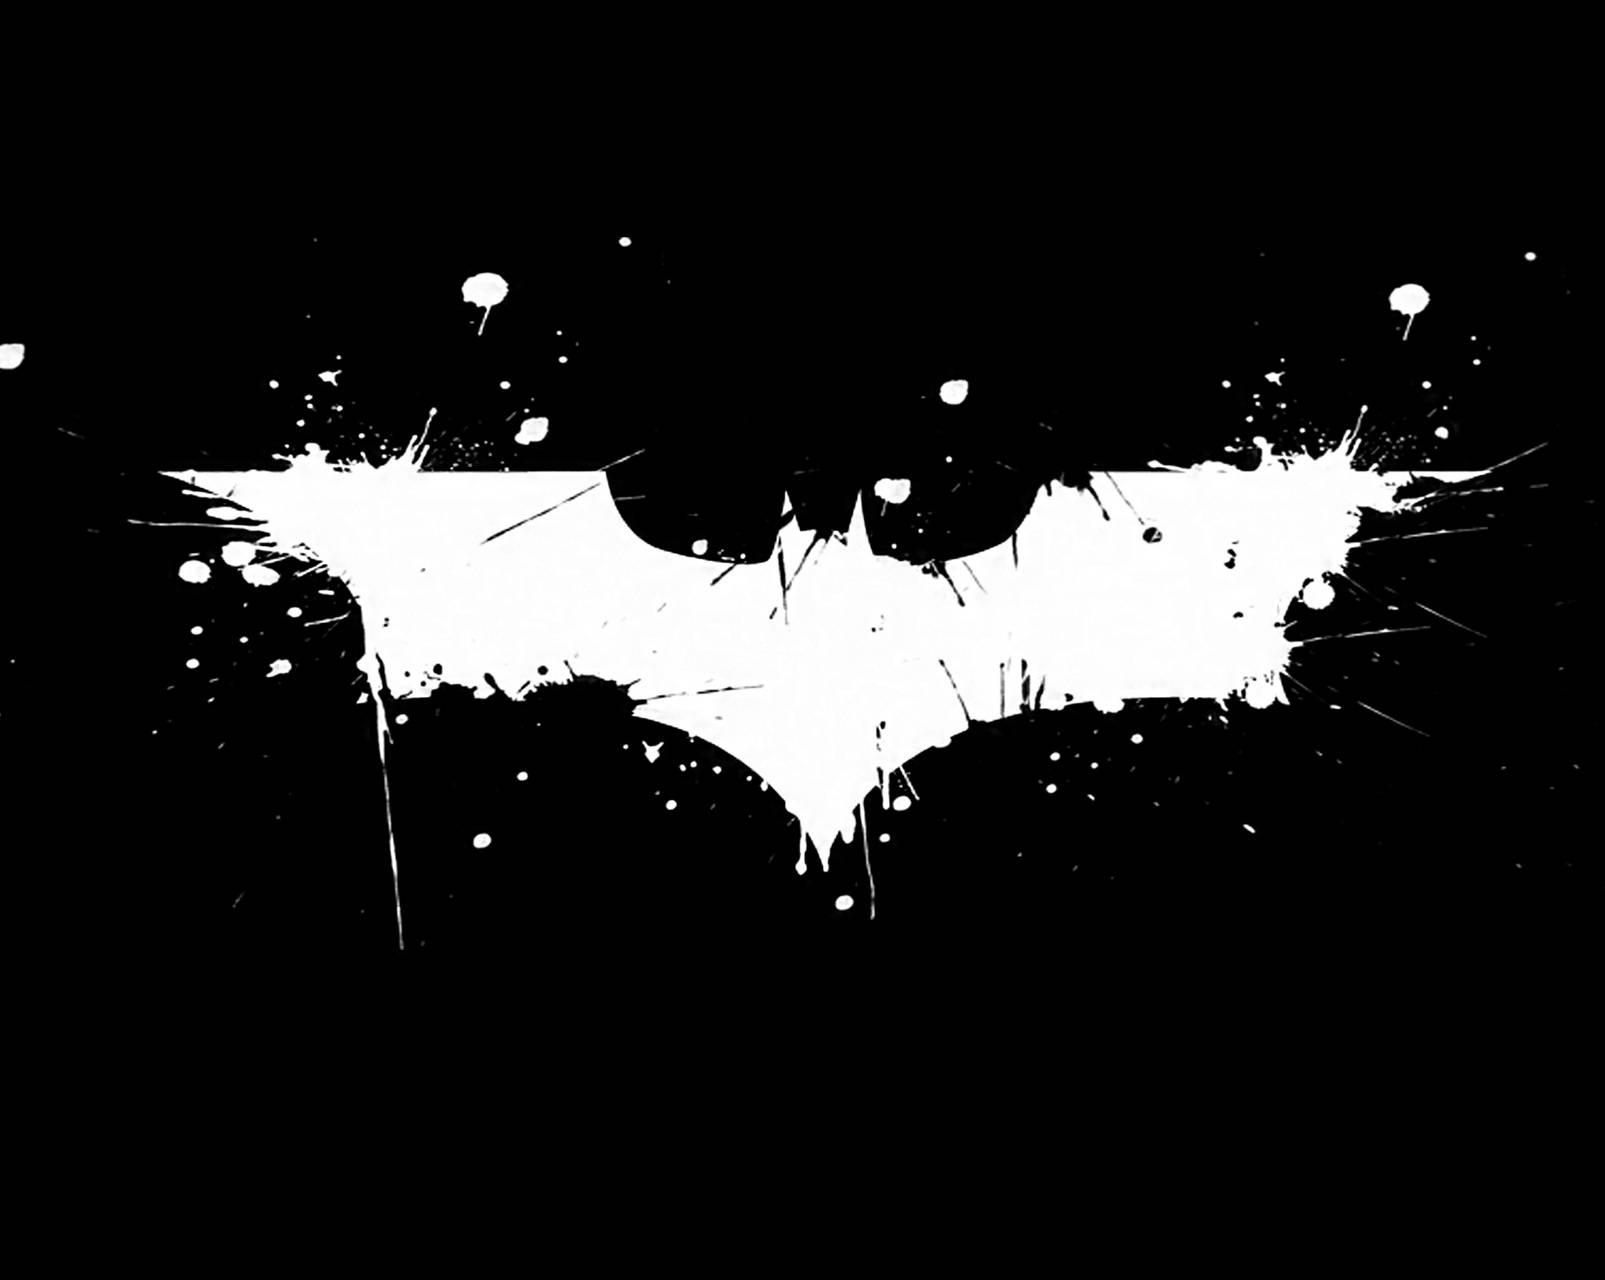 Batmans logo